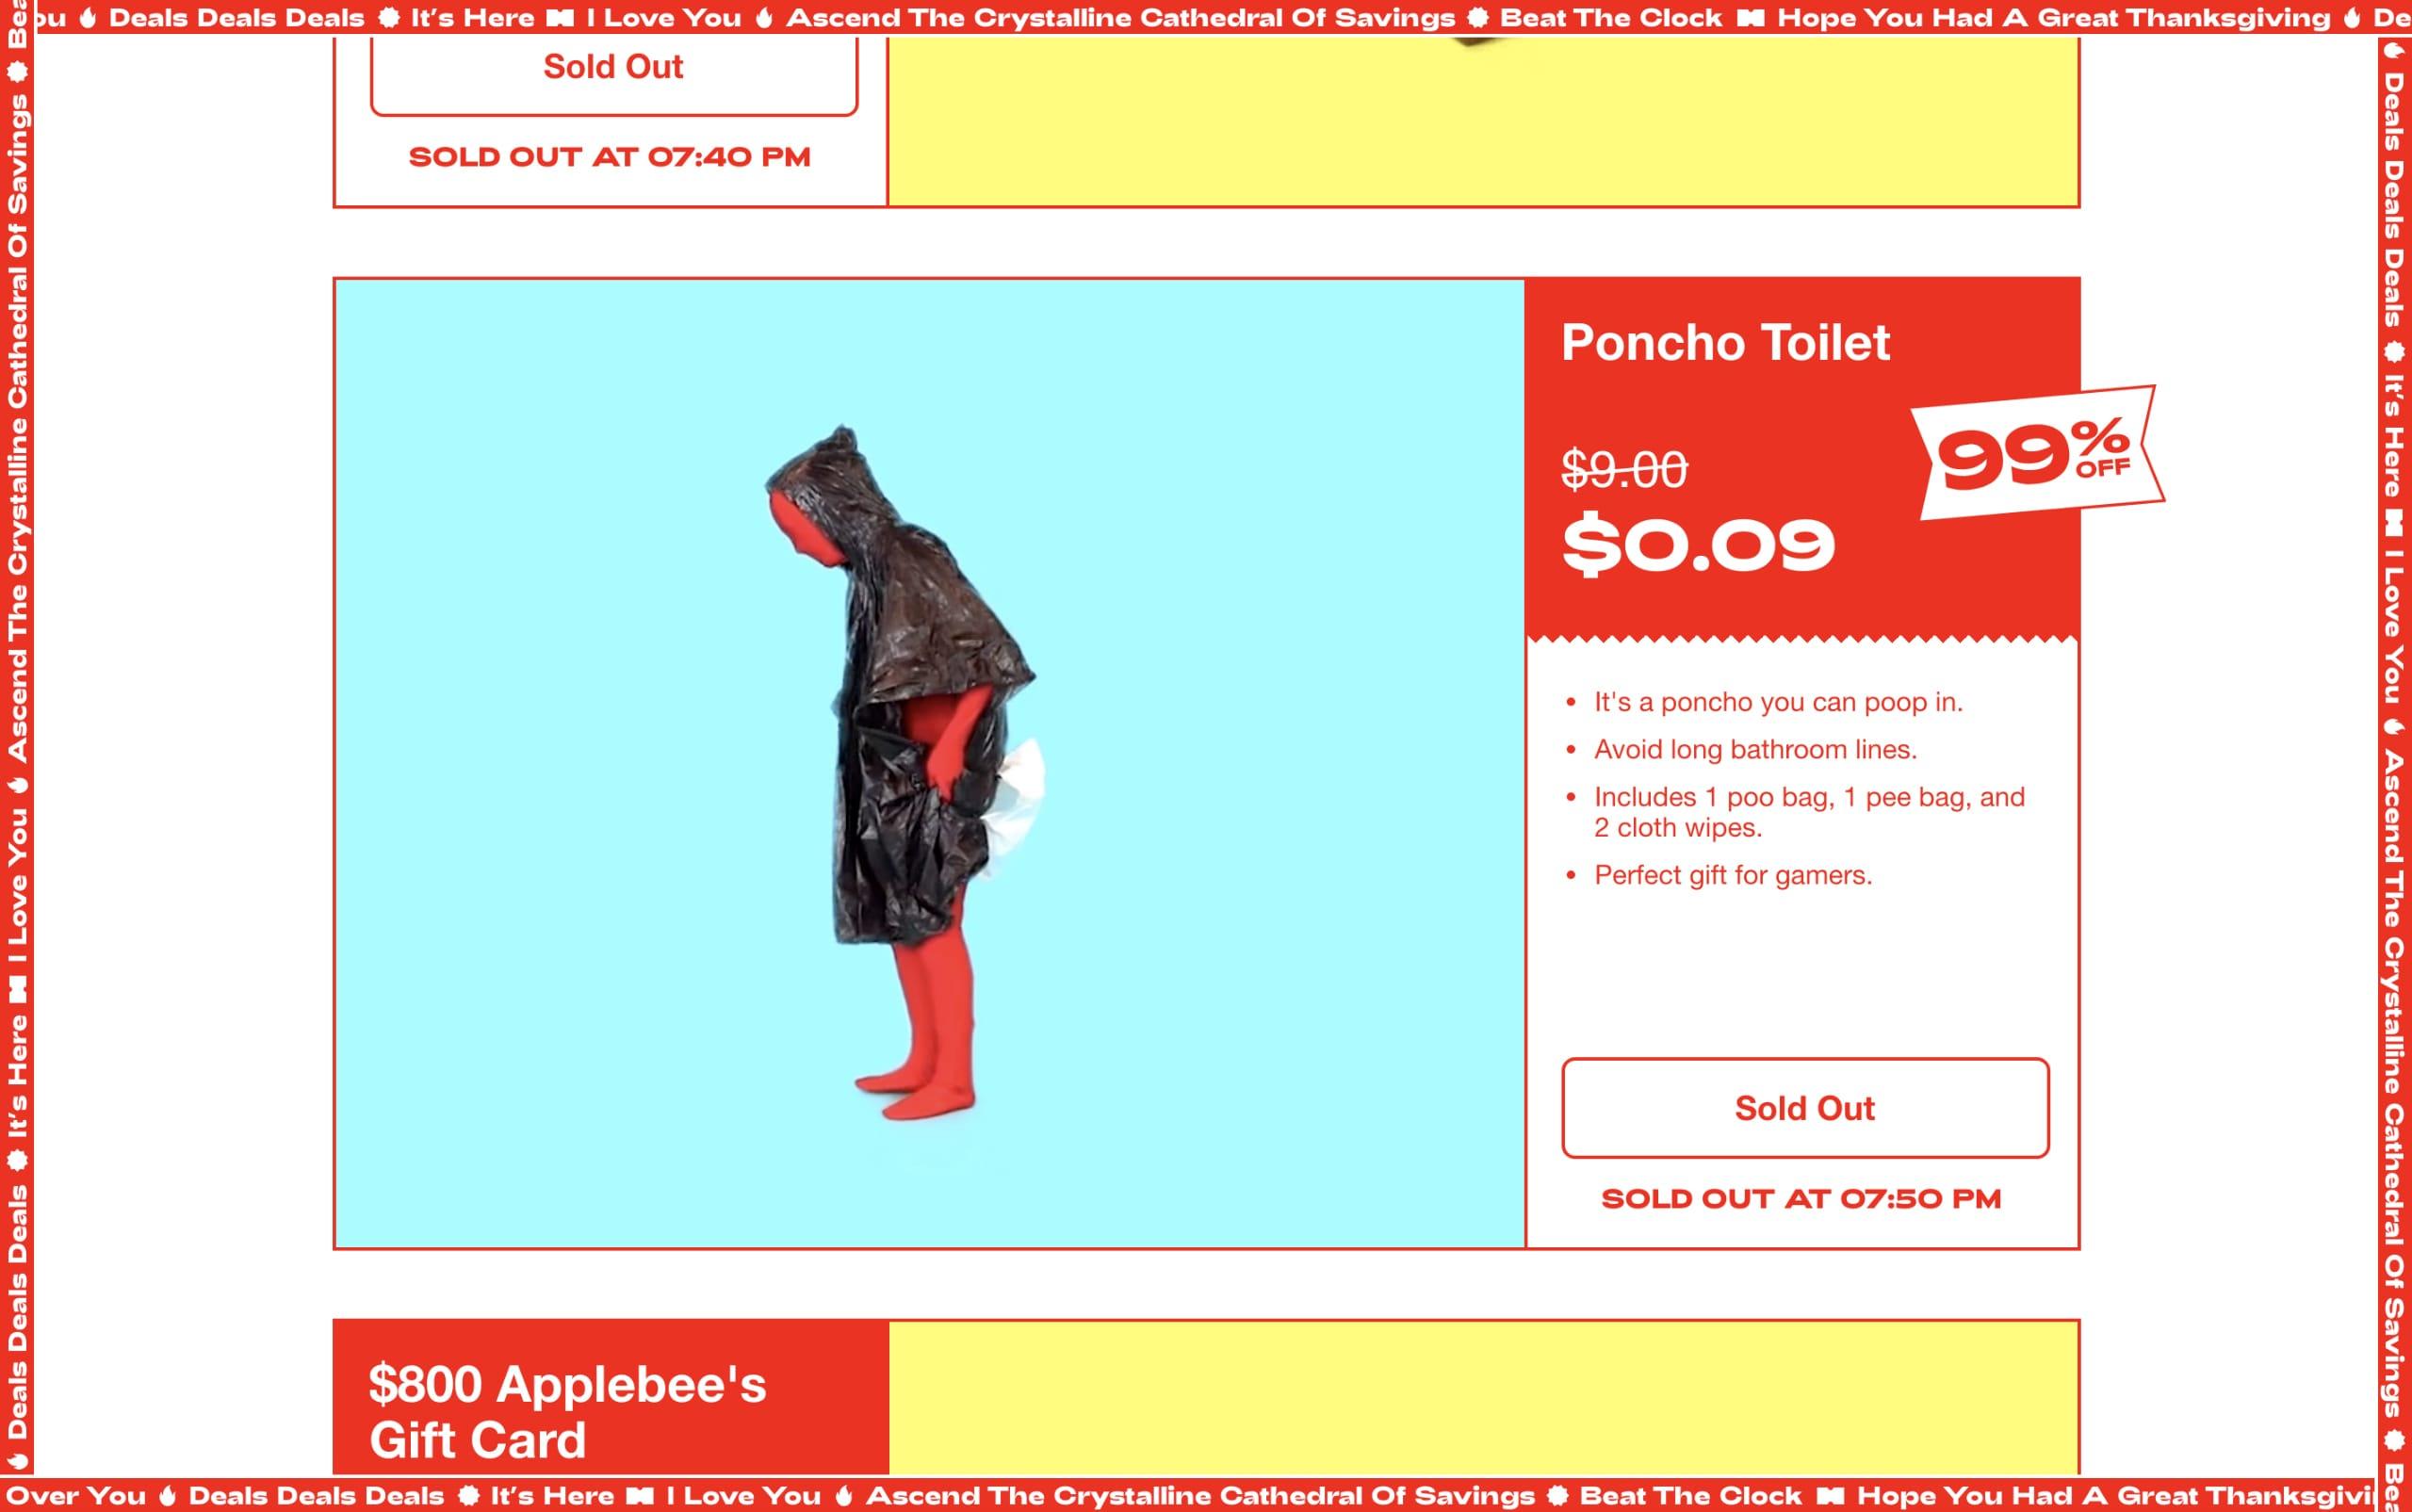 The 99% Sale Website Screenshot